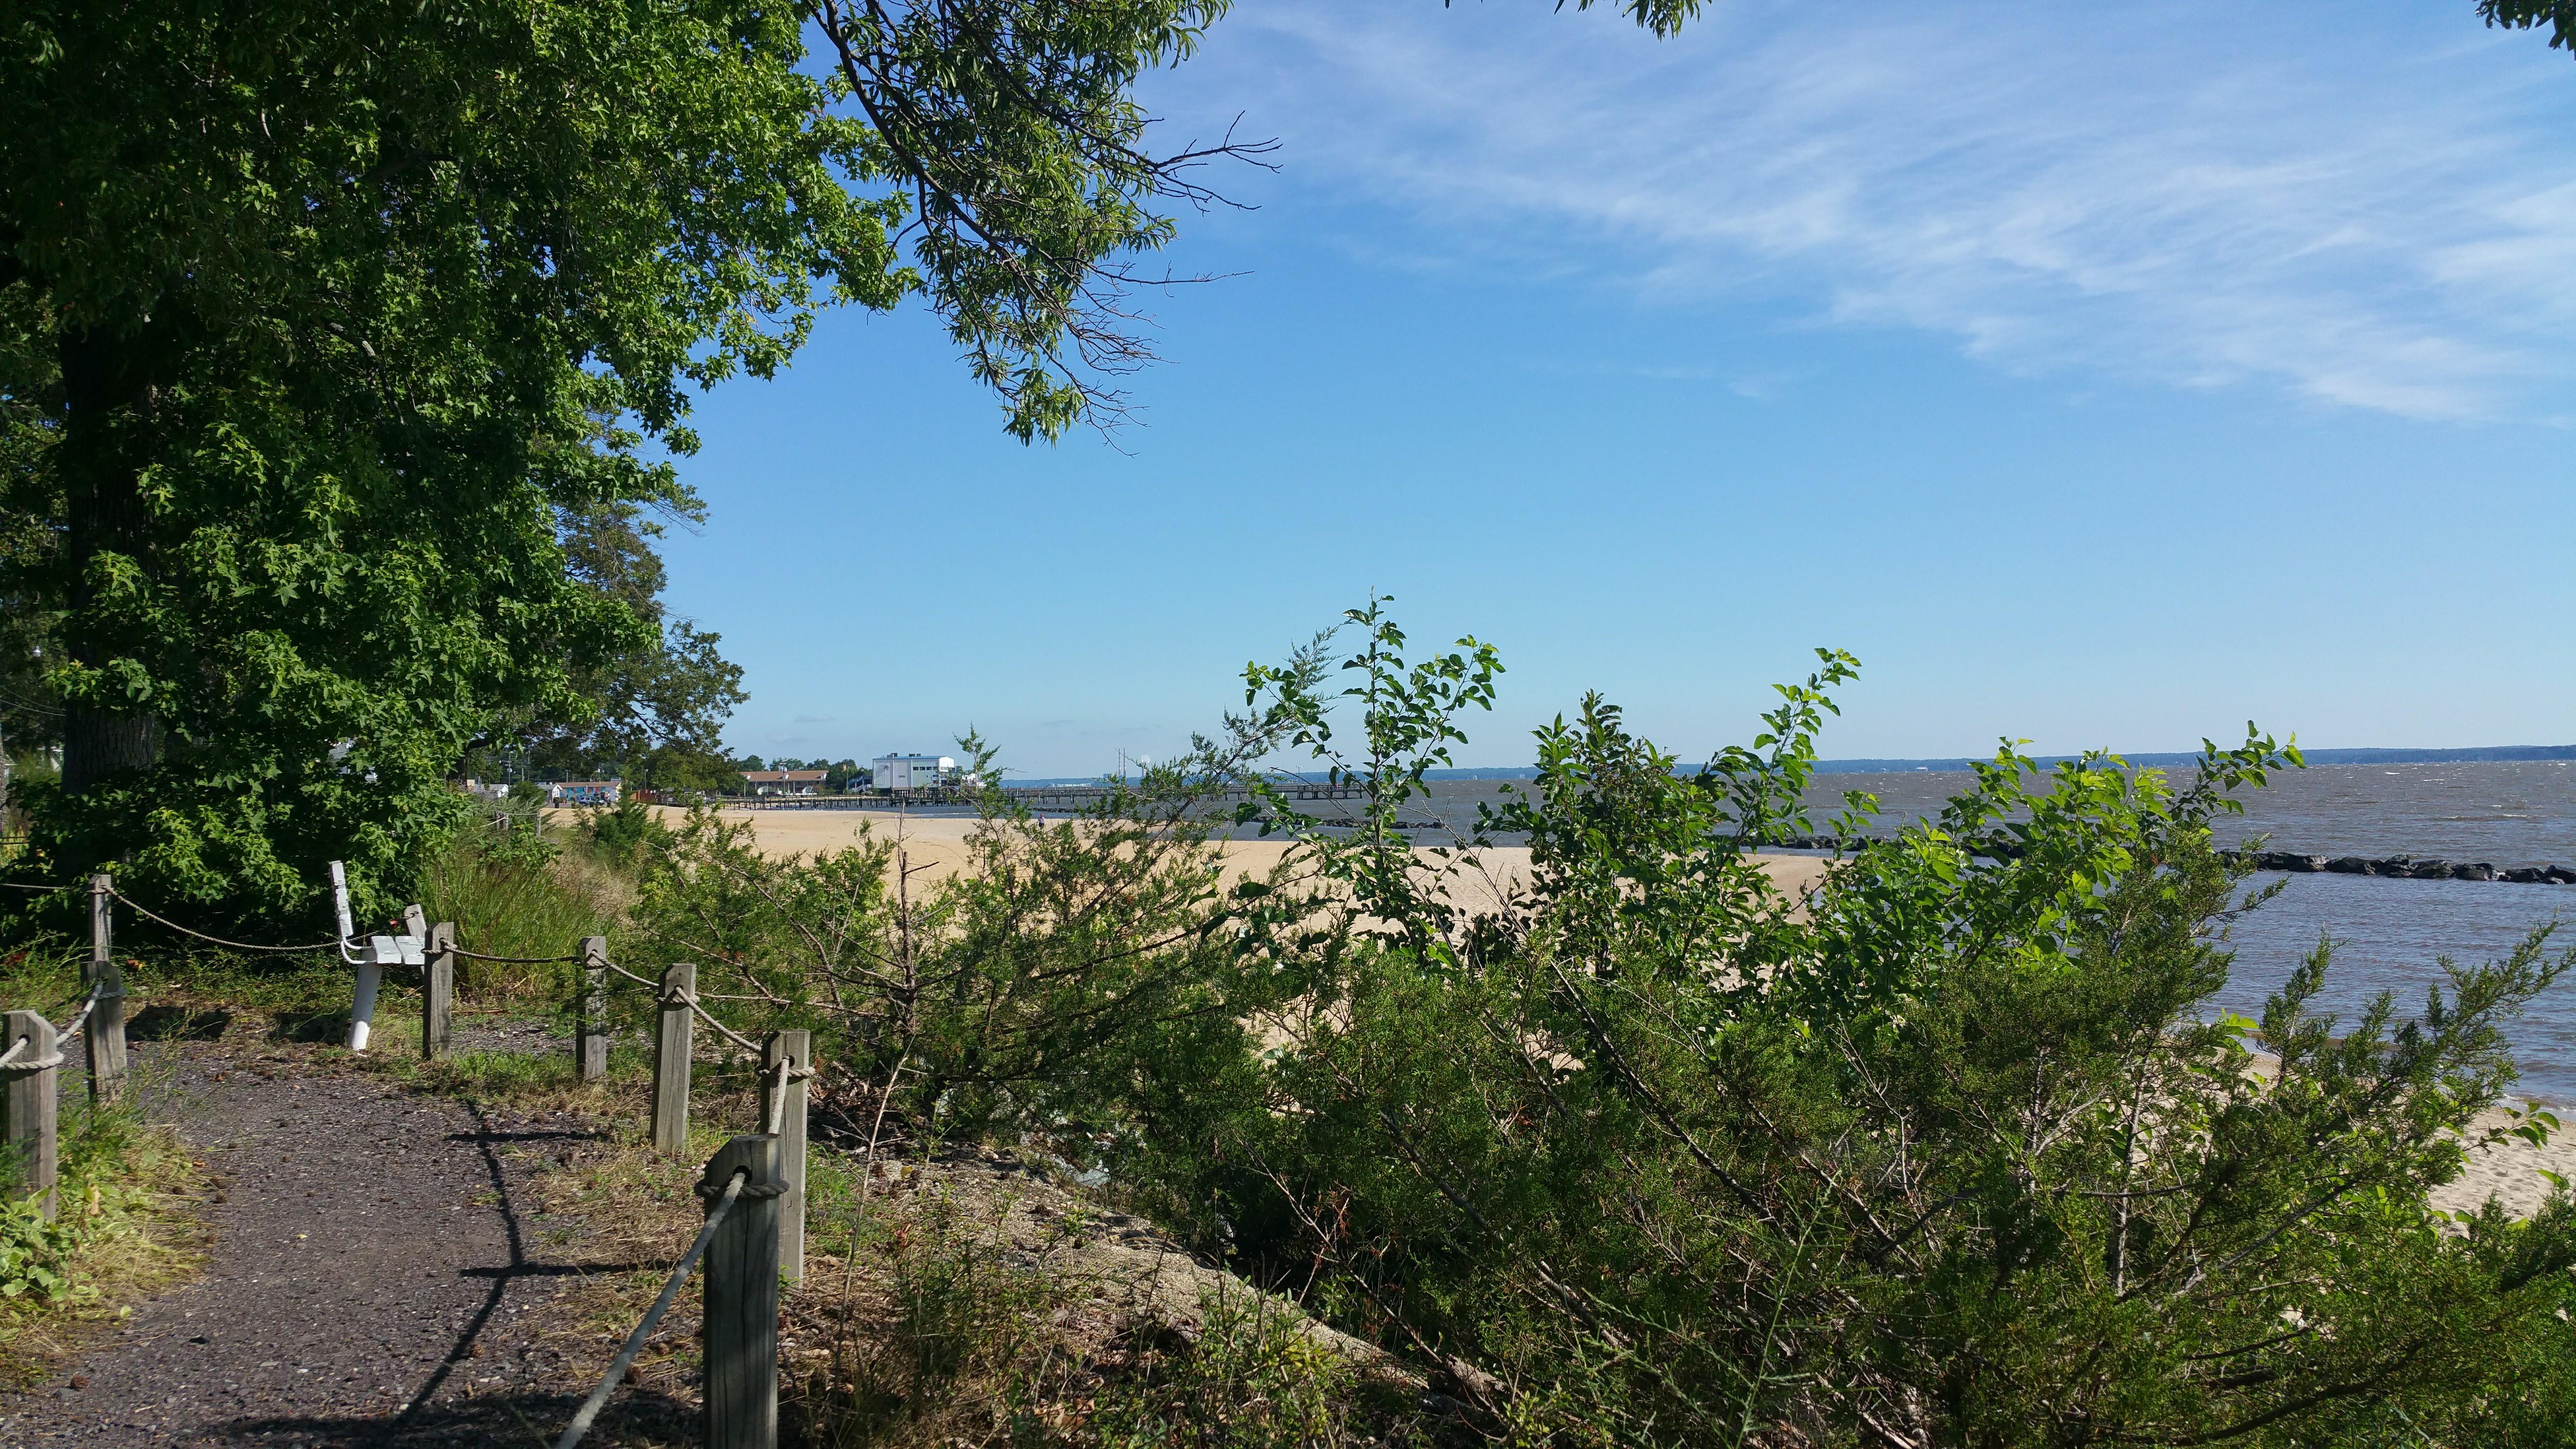 Walking Trails and Boardwalk